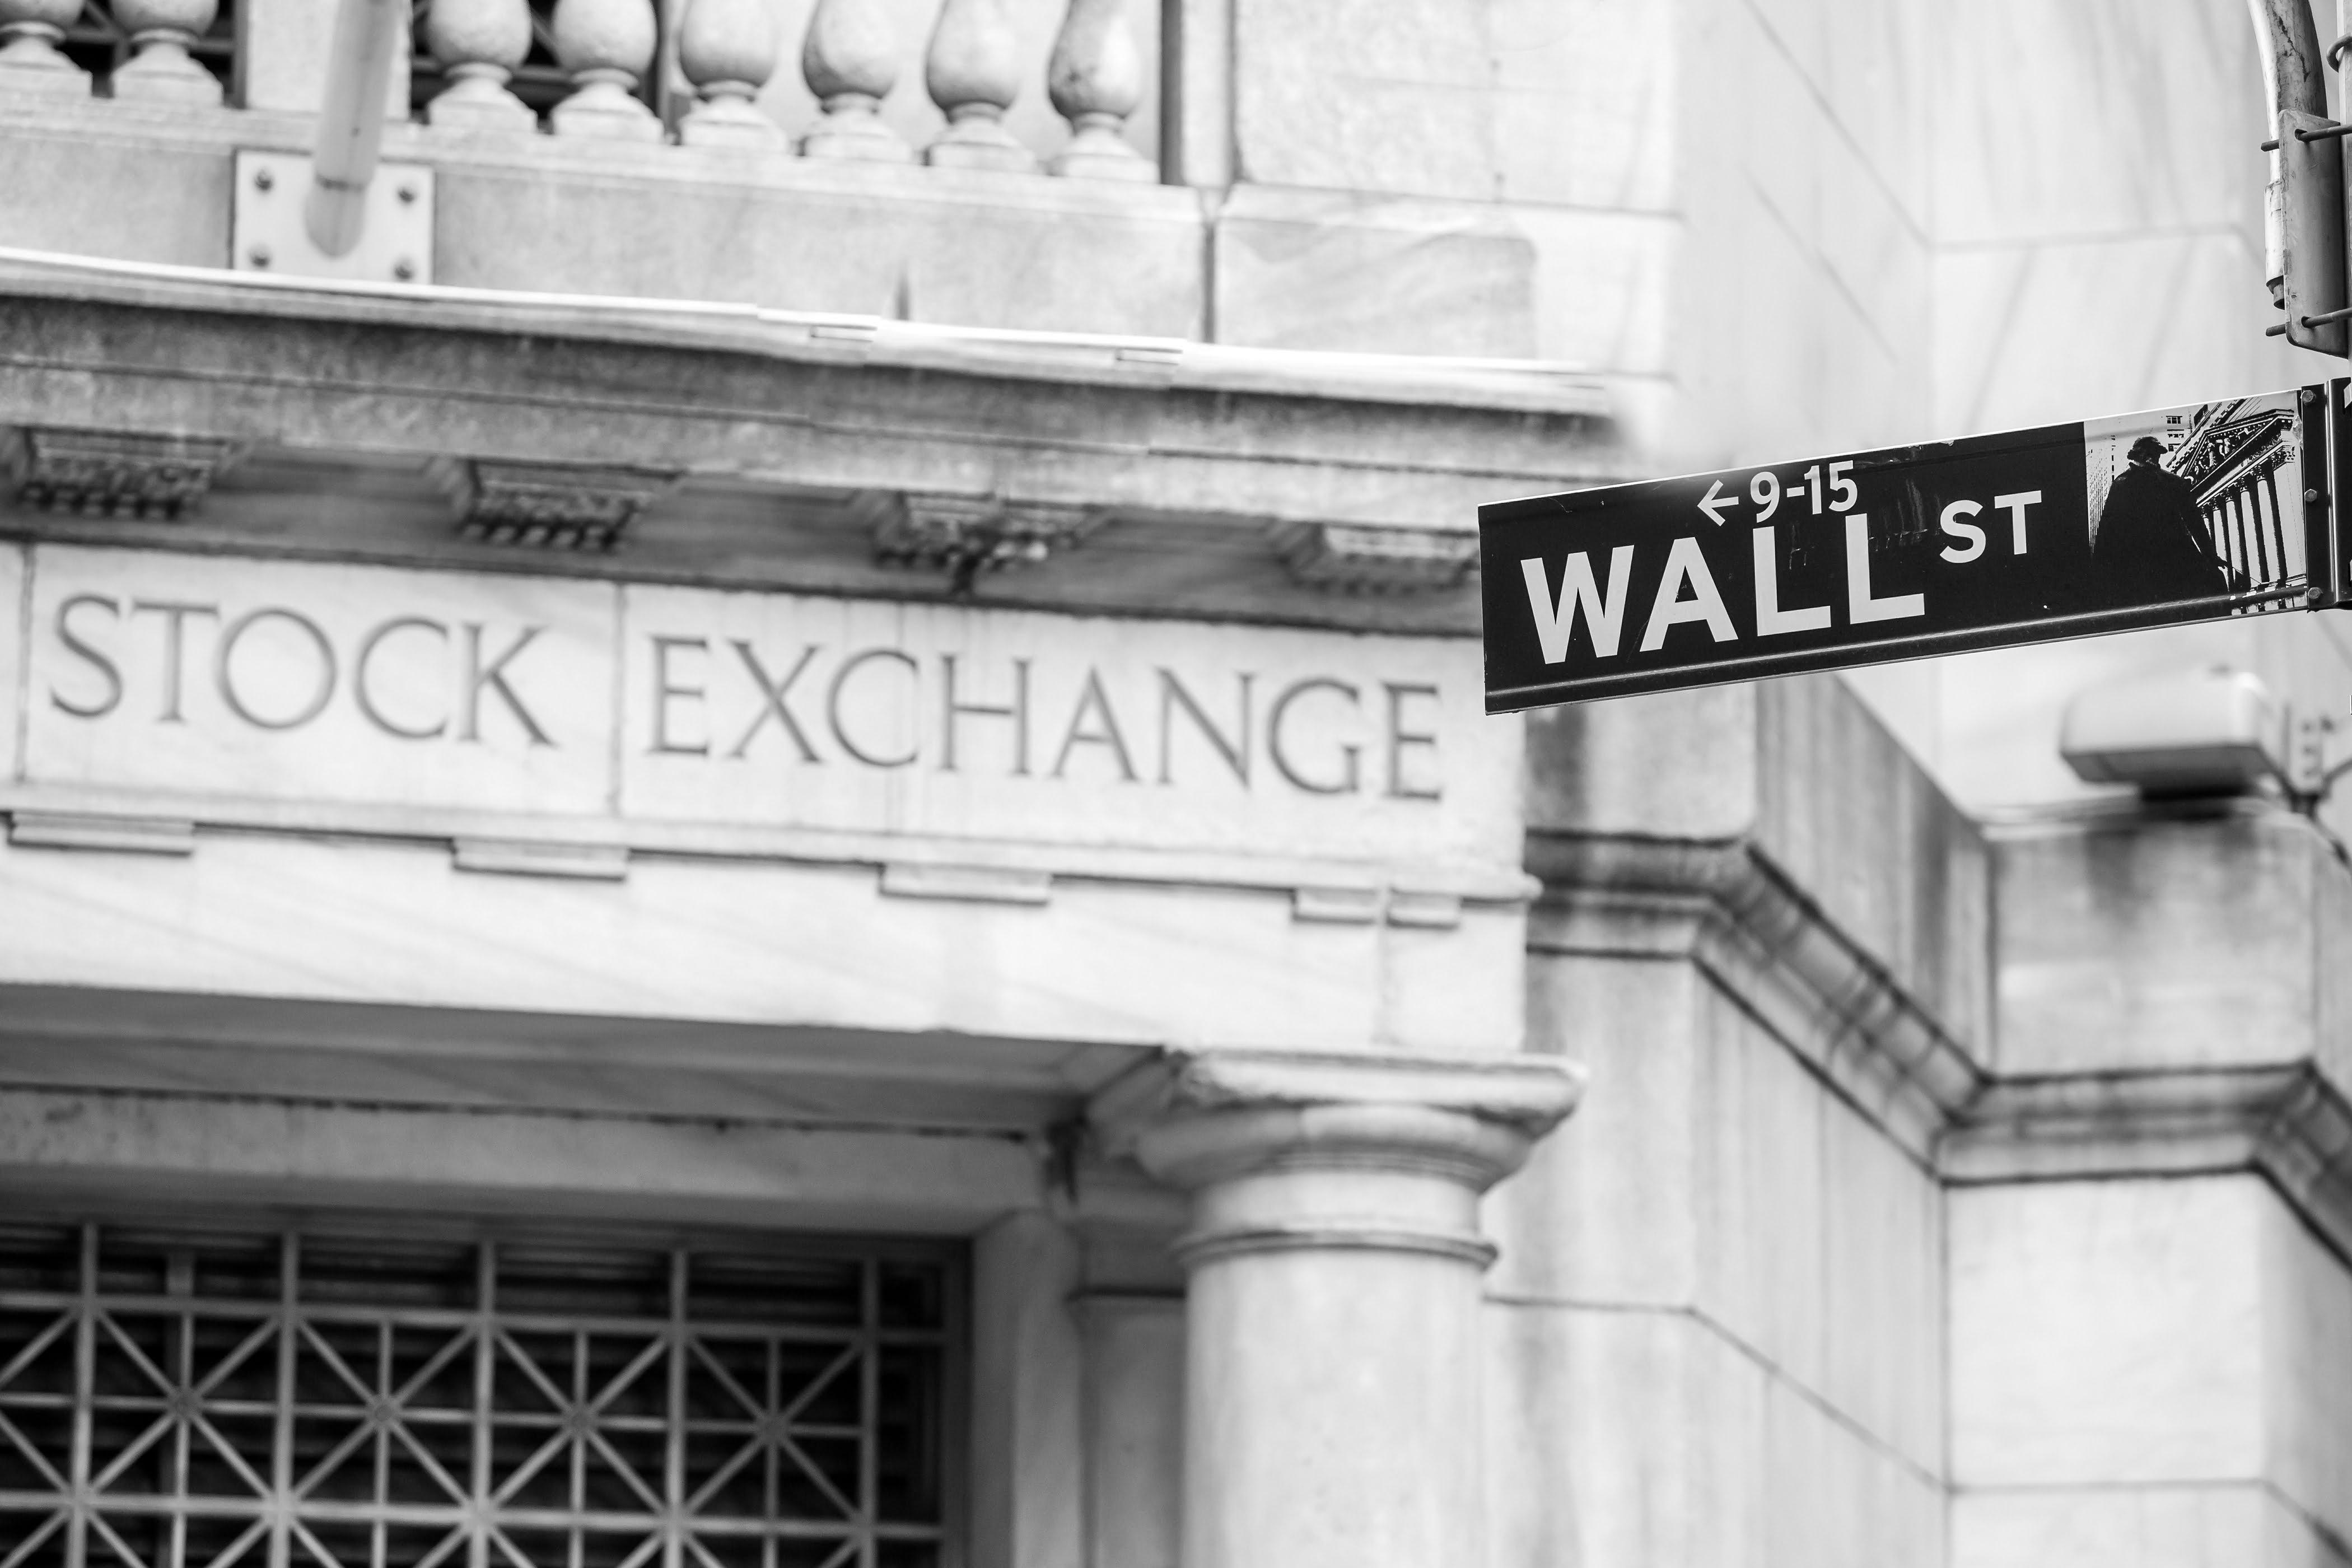 Economist Claims Investors Should Expect Volatile Stock Market in 2019